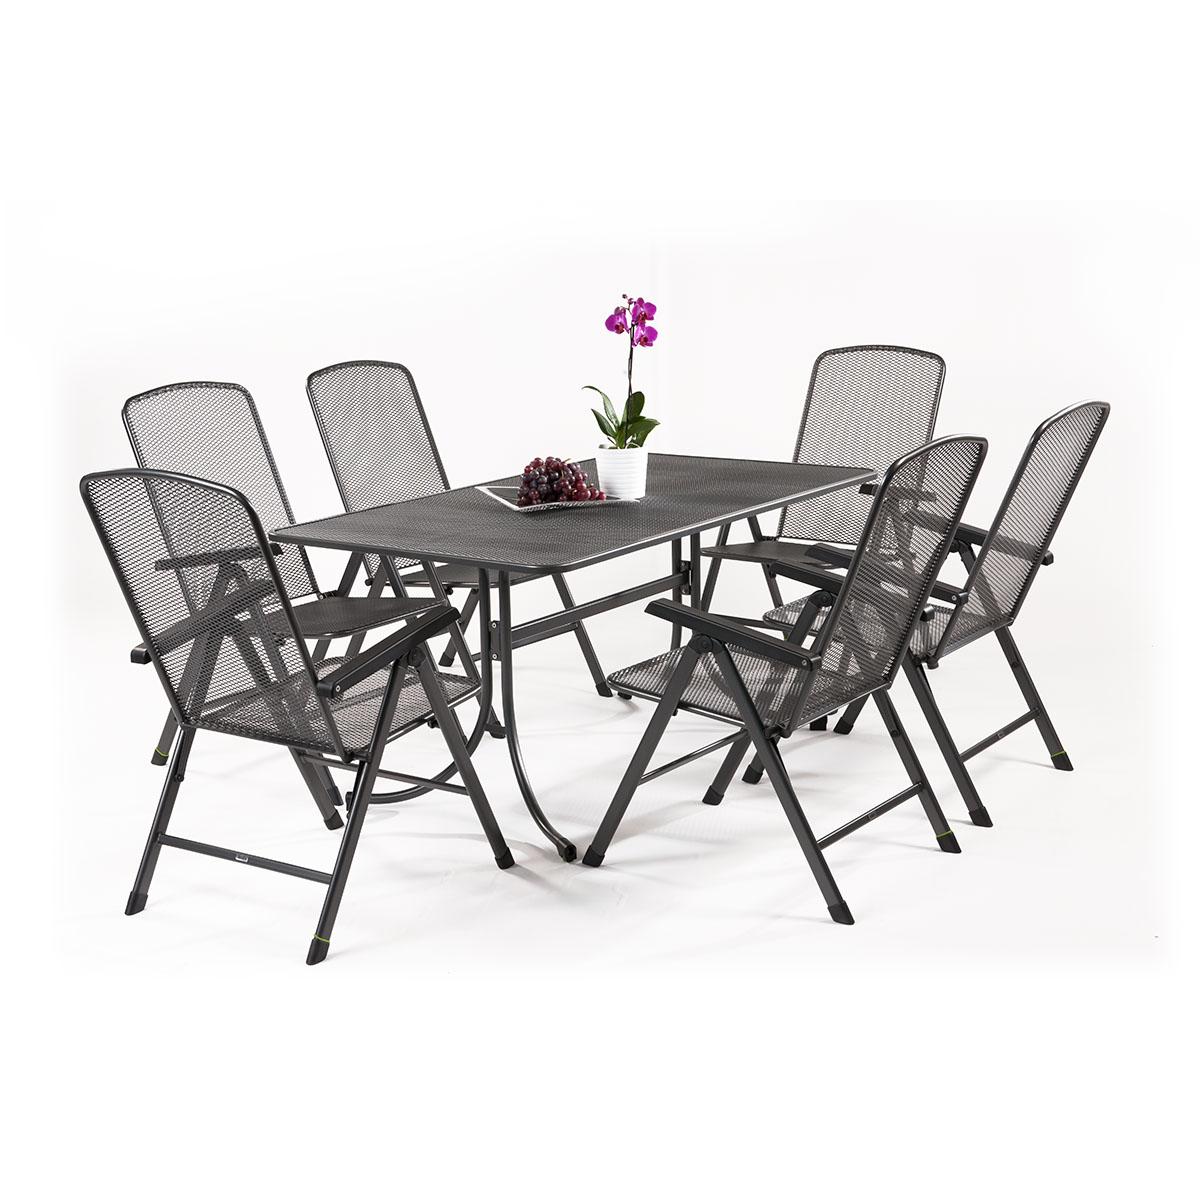 MWH Basani 6+, sestava nábytku z tahokovu (6x pol. křeslo Savoy Basic, 1x stůl Universal 160)